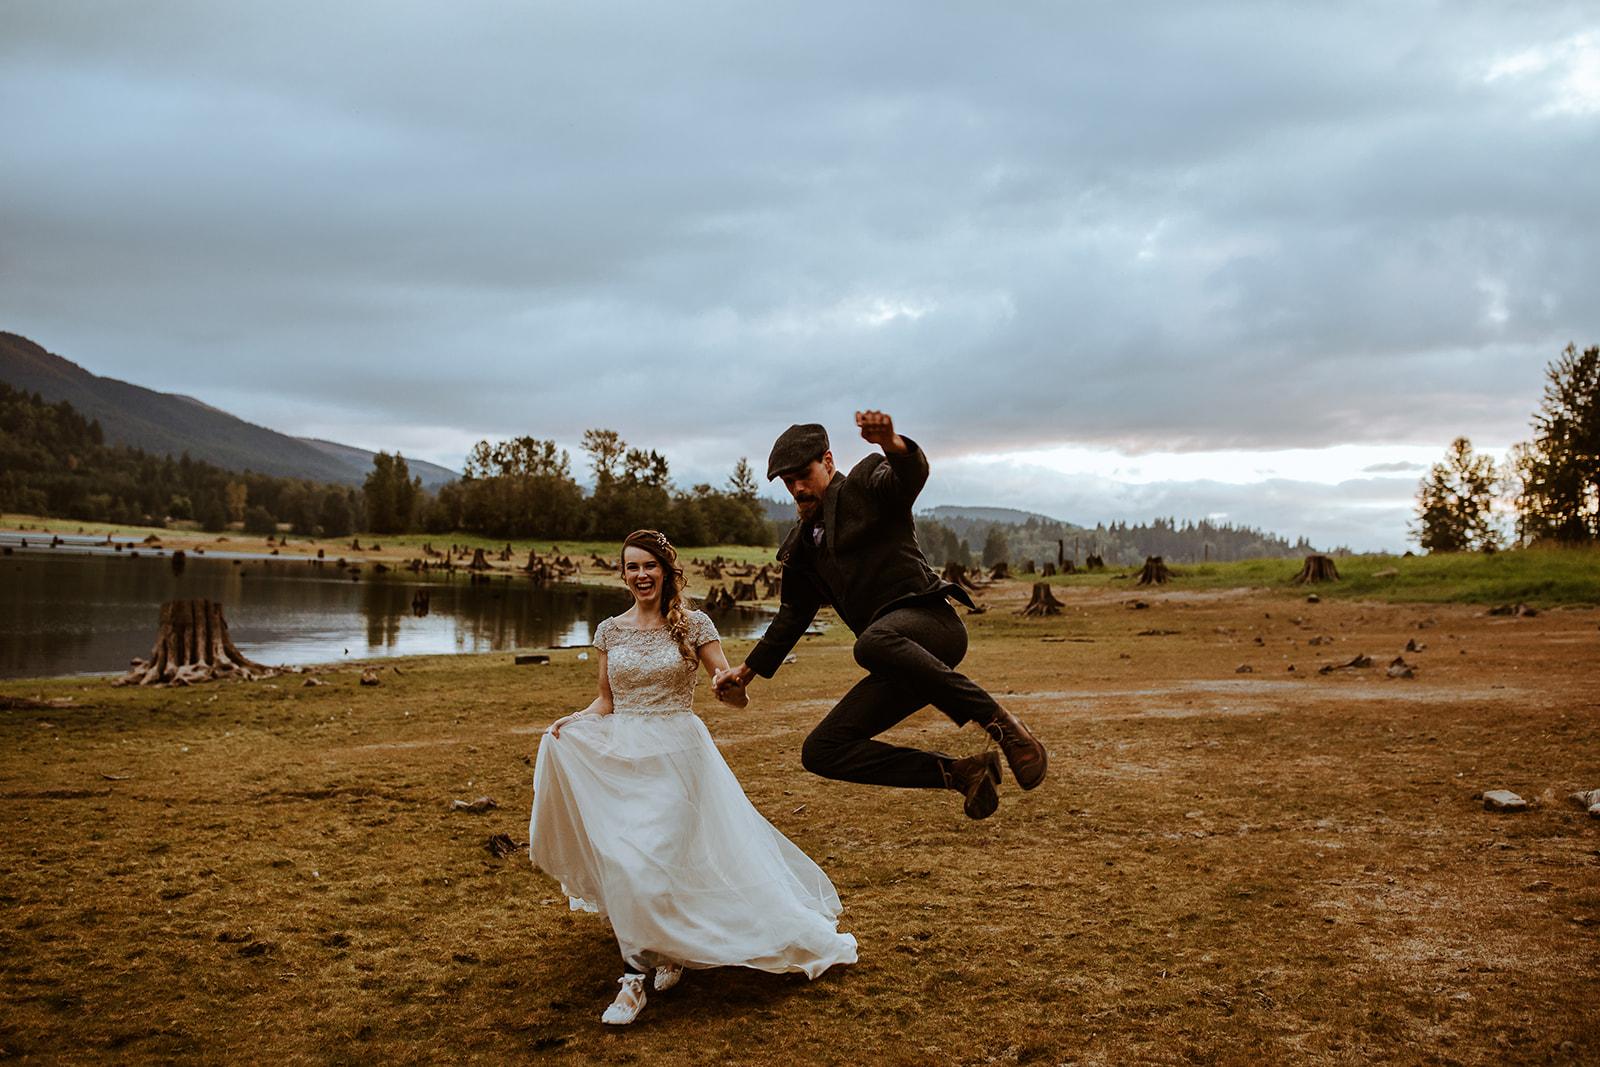 mount-rainier-cabin-elopement-megan-gallagher-photography_(510_of_568).jpg